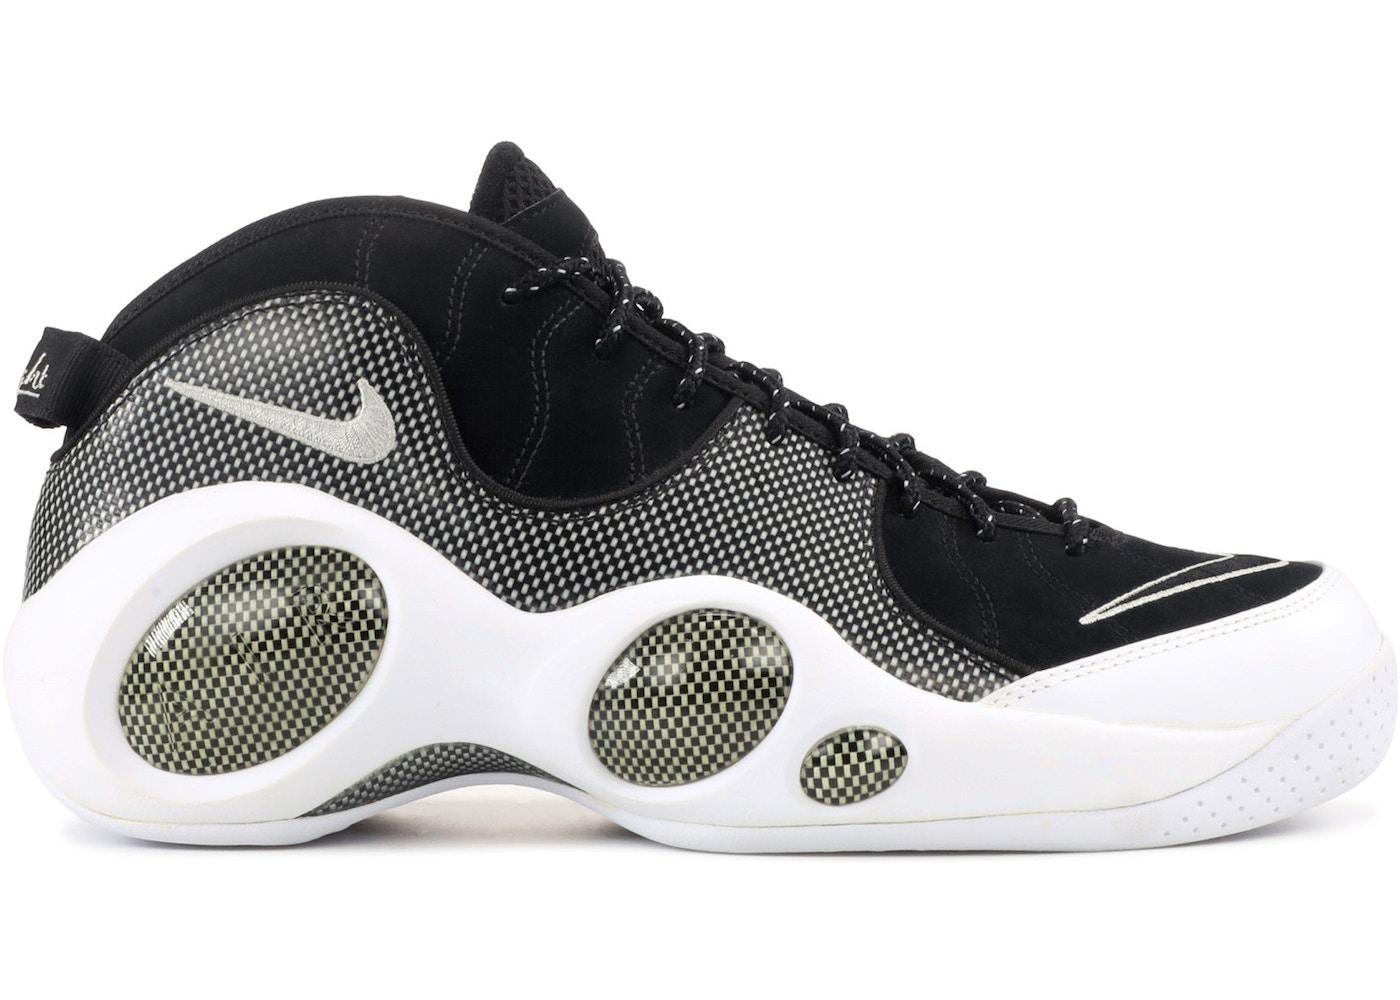 Nike Air Zoom Flight 95 Black White (2008)